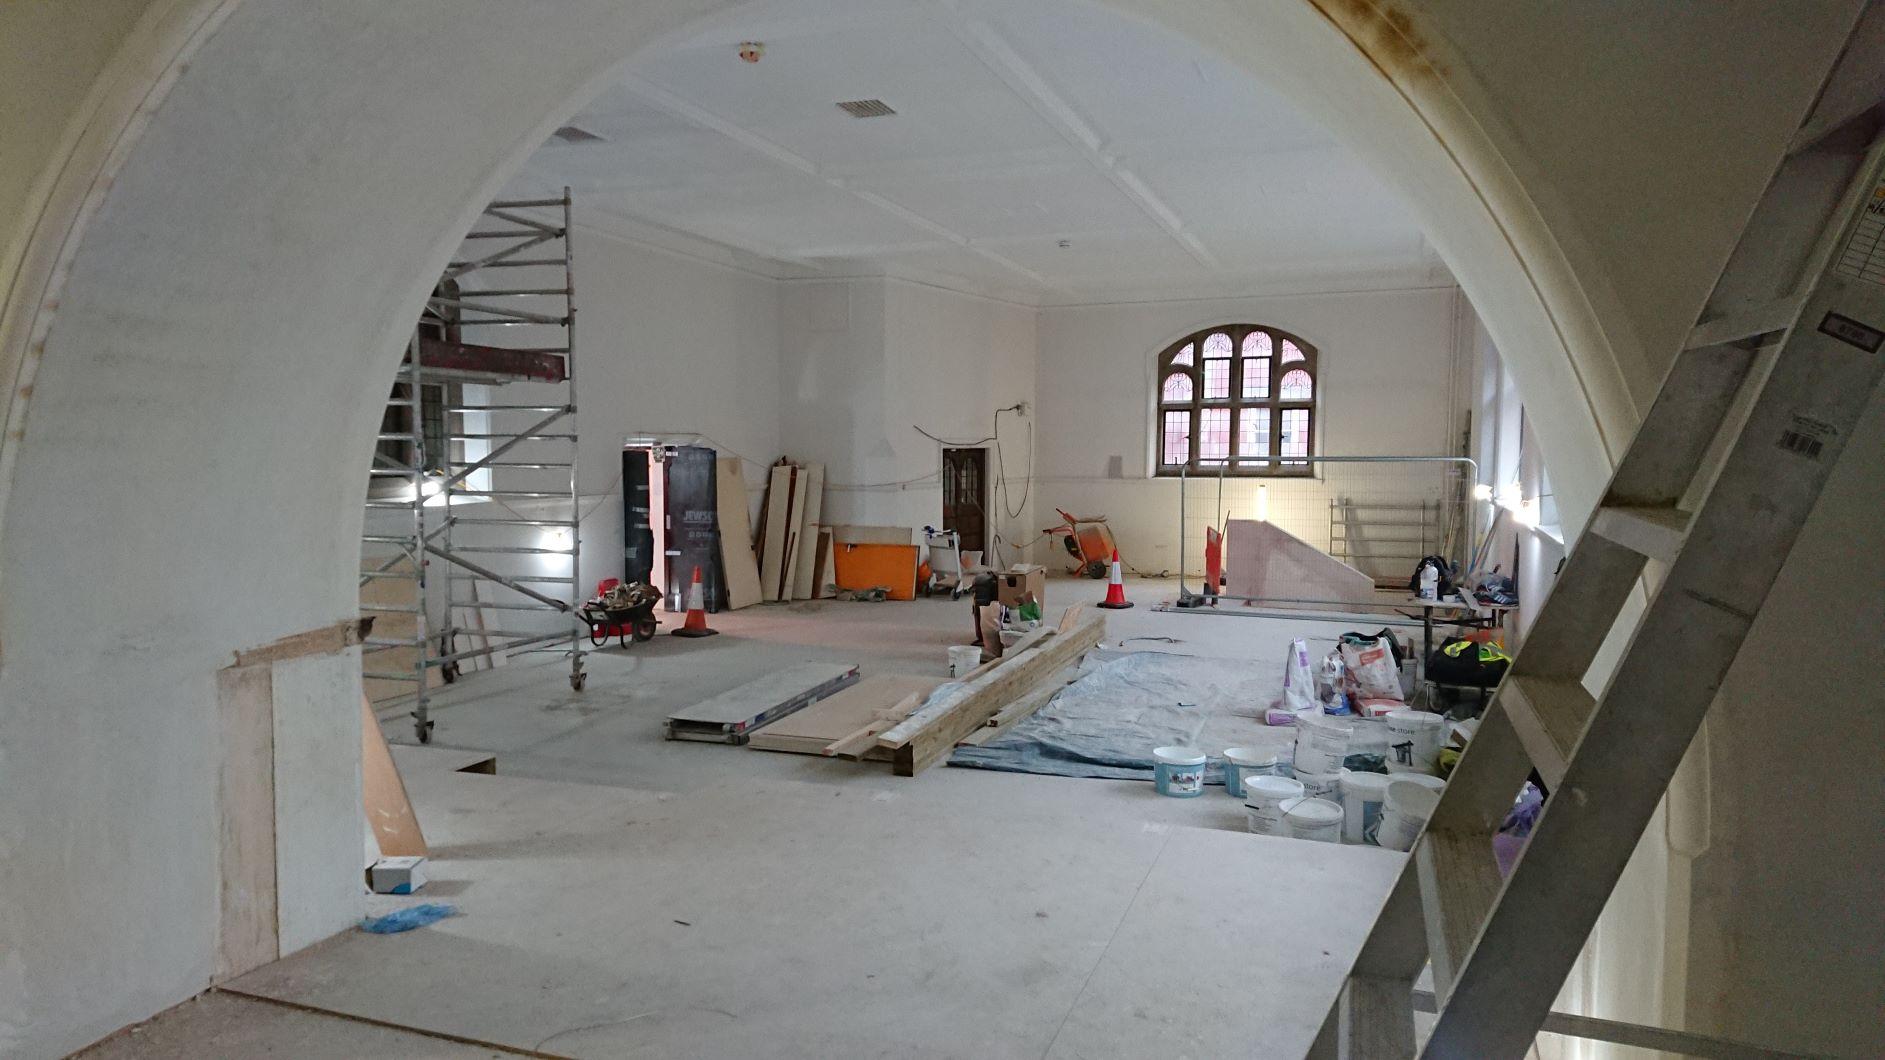 Museum space in progress, February 2021